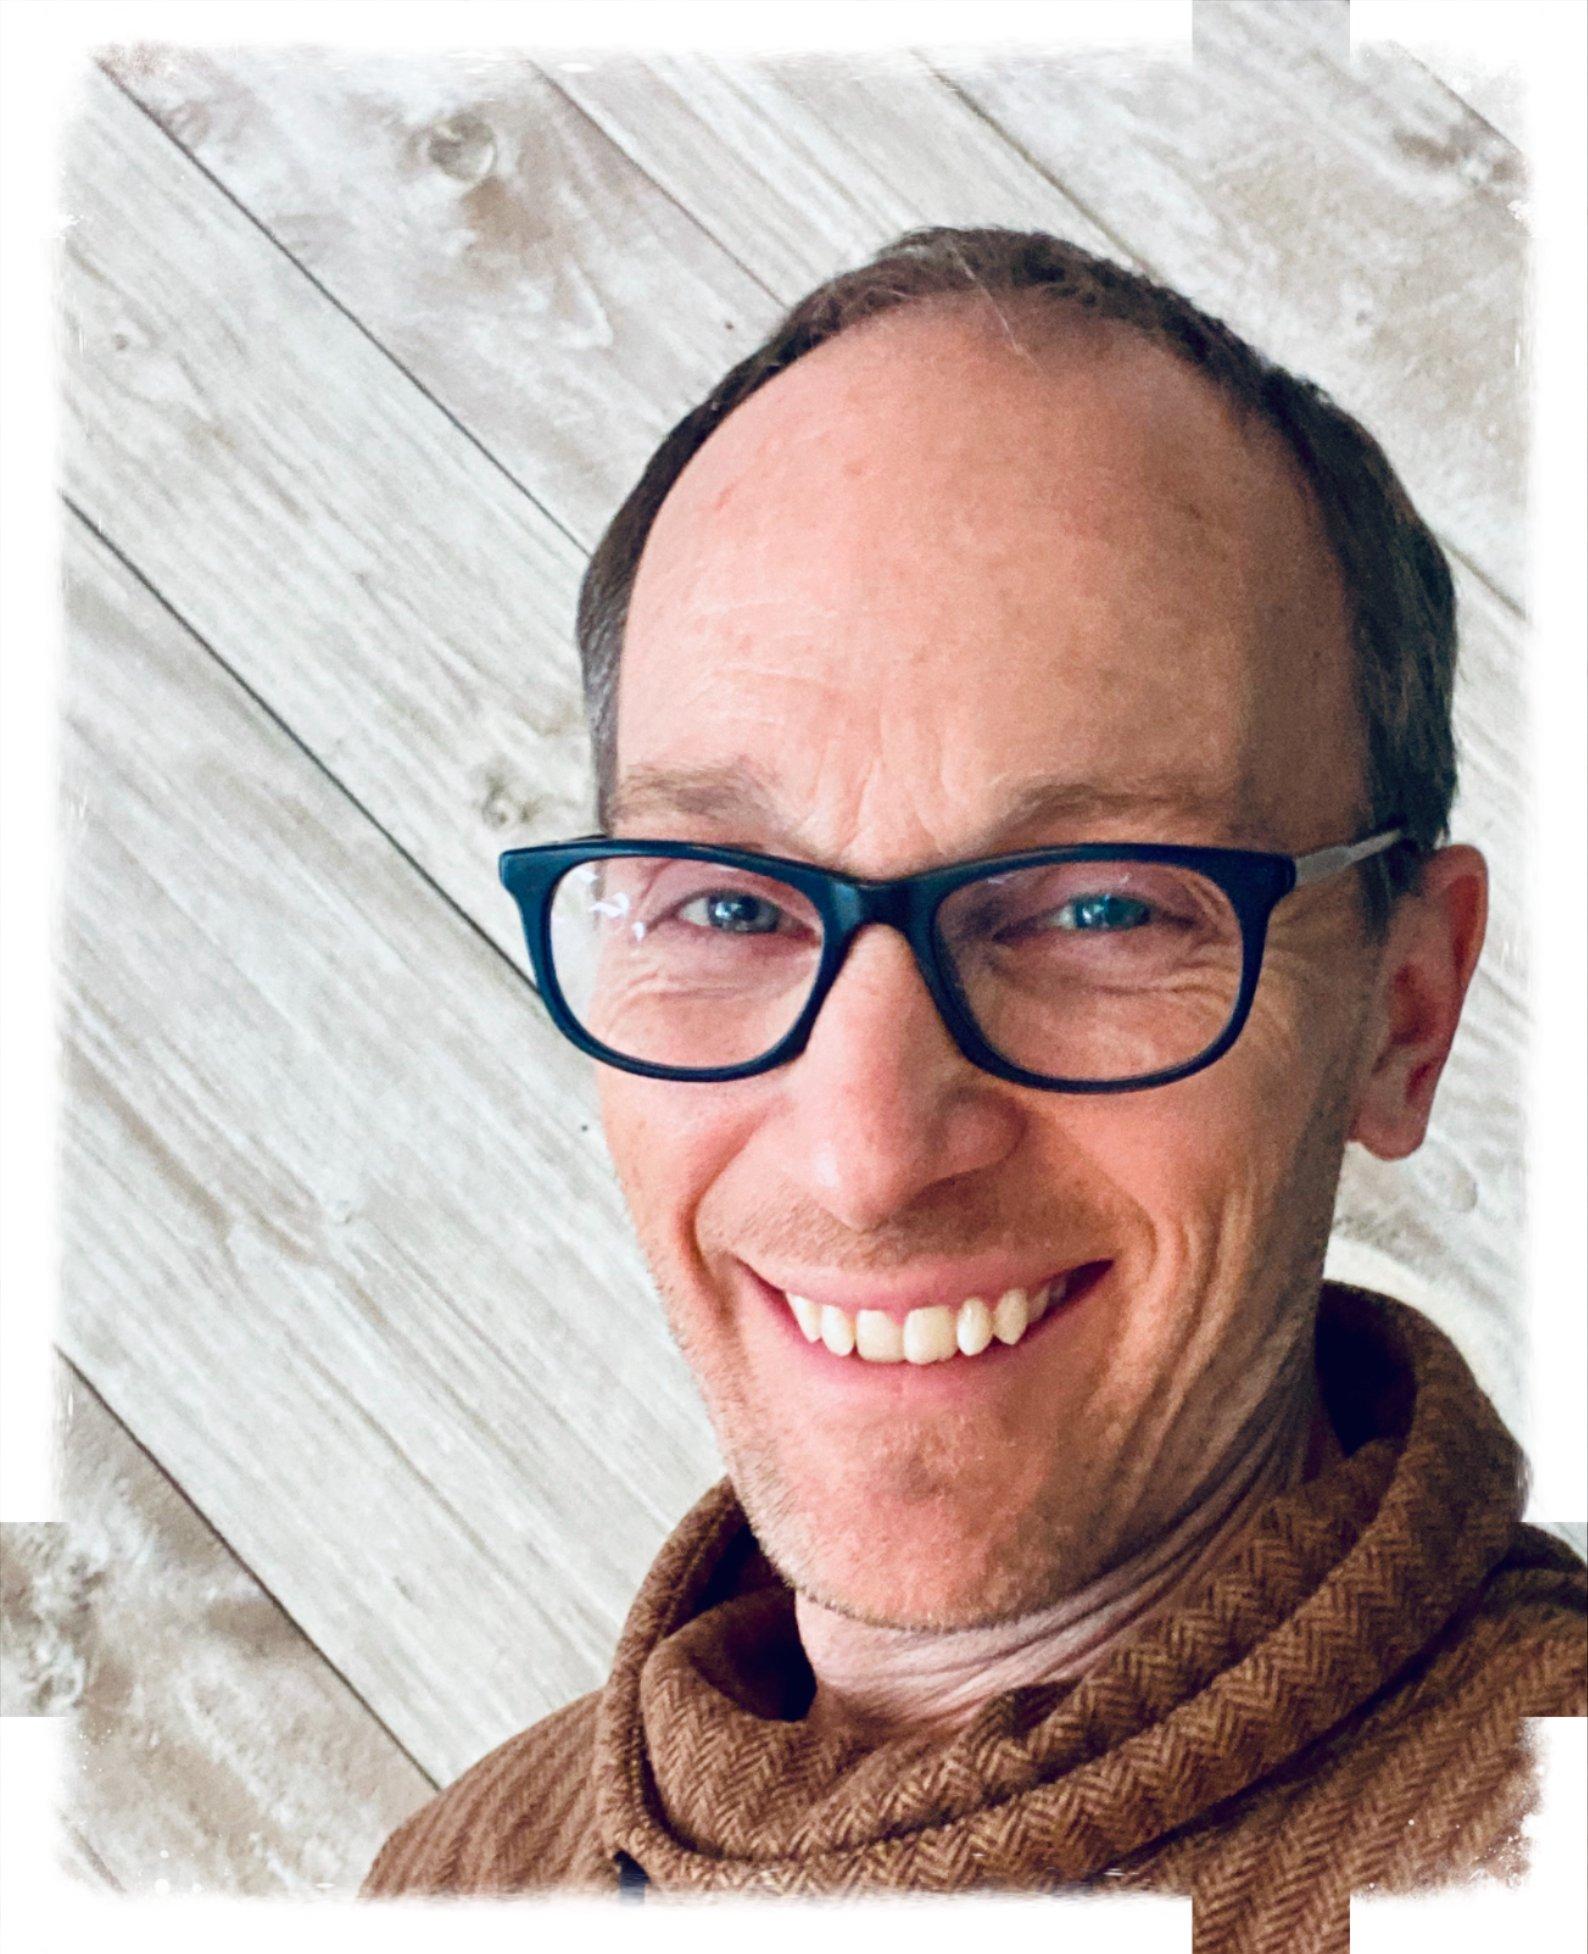 Meet the VoiceOps Team: Dan Miller, Head of Customer Success